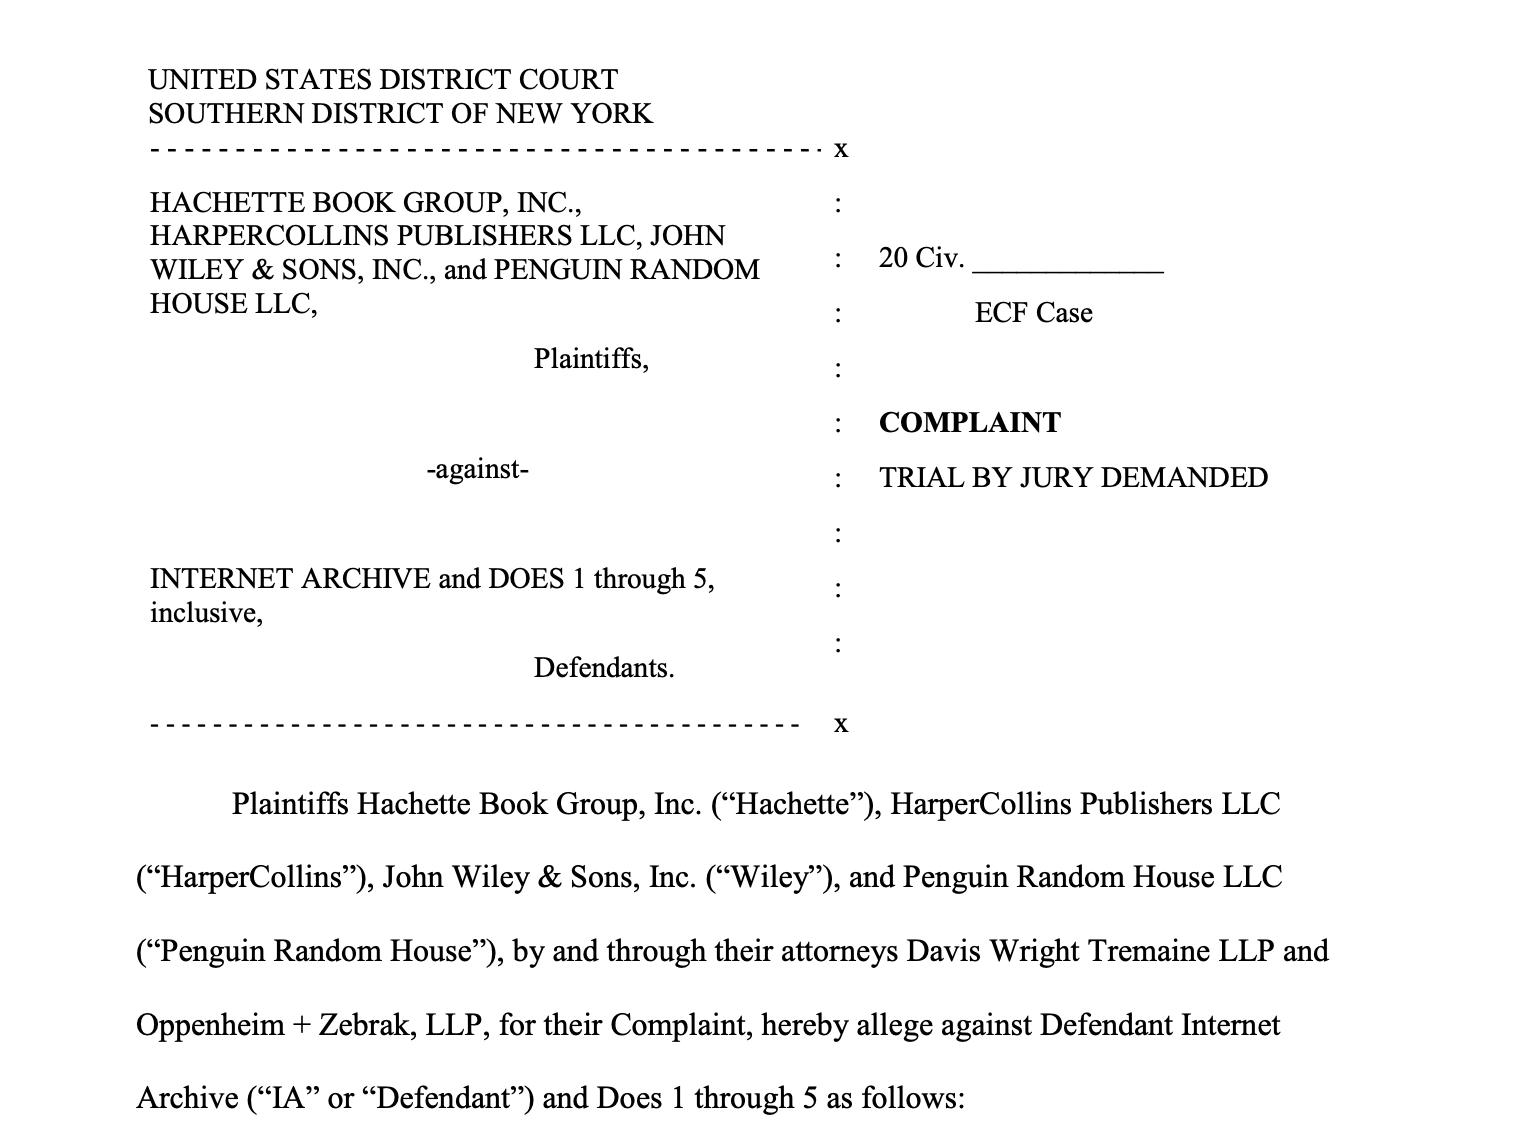 Lawsuit document against Internet Archive by 4 corporate publishers